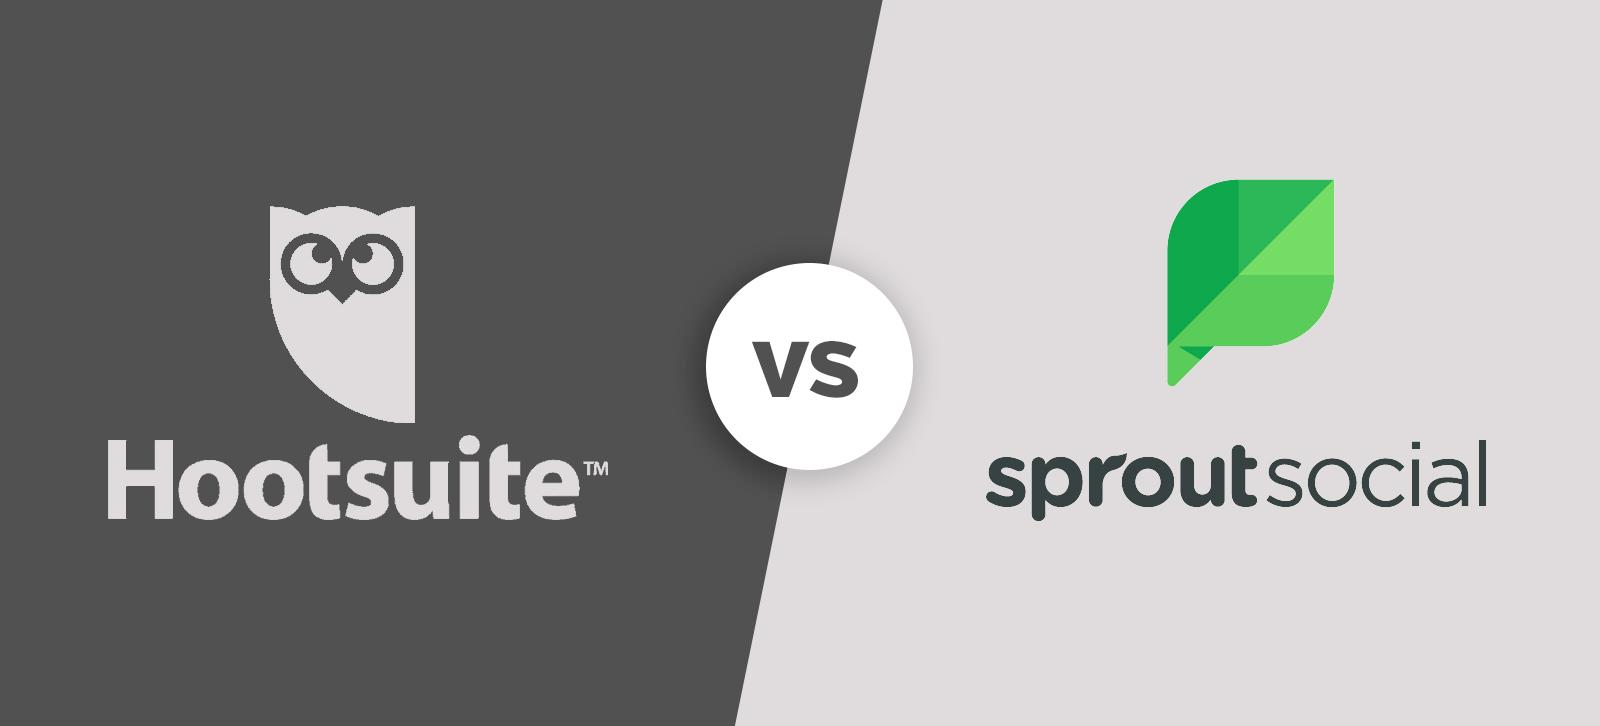 Sprout Social vs. Hootsuite: The Ultimate Comparison